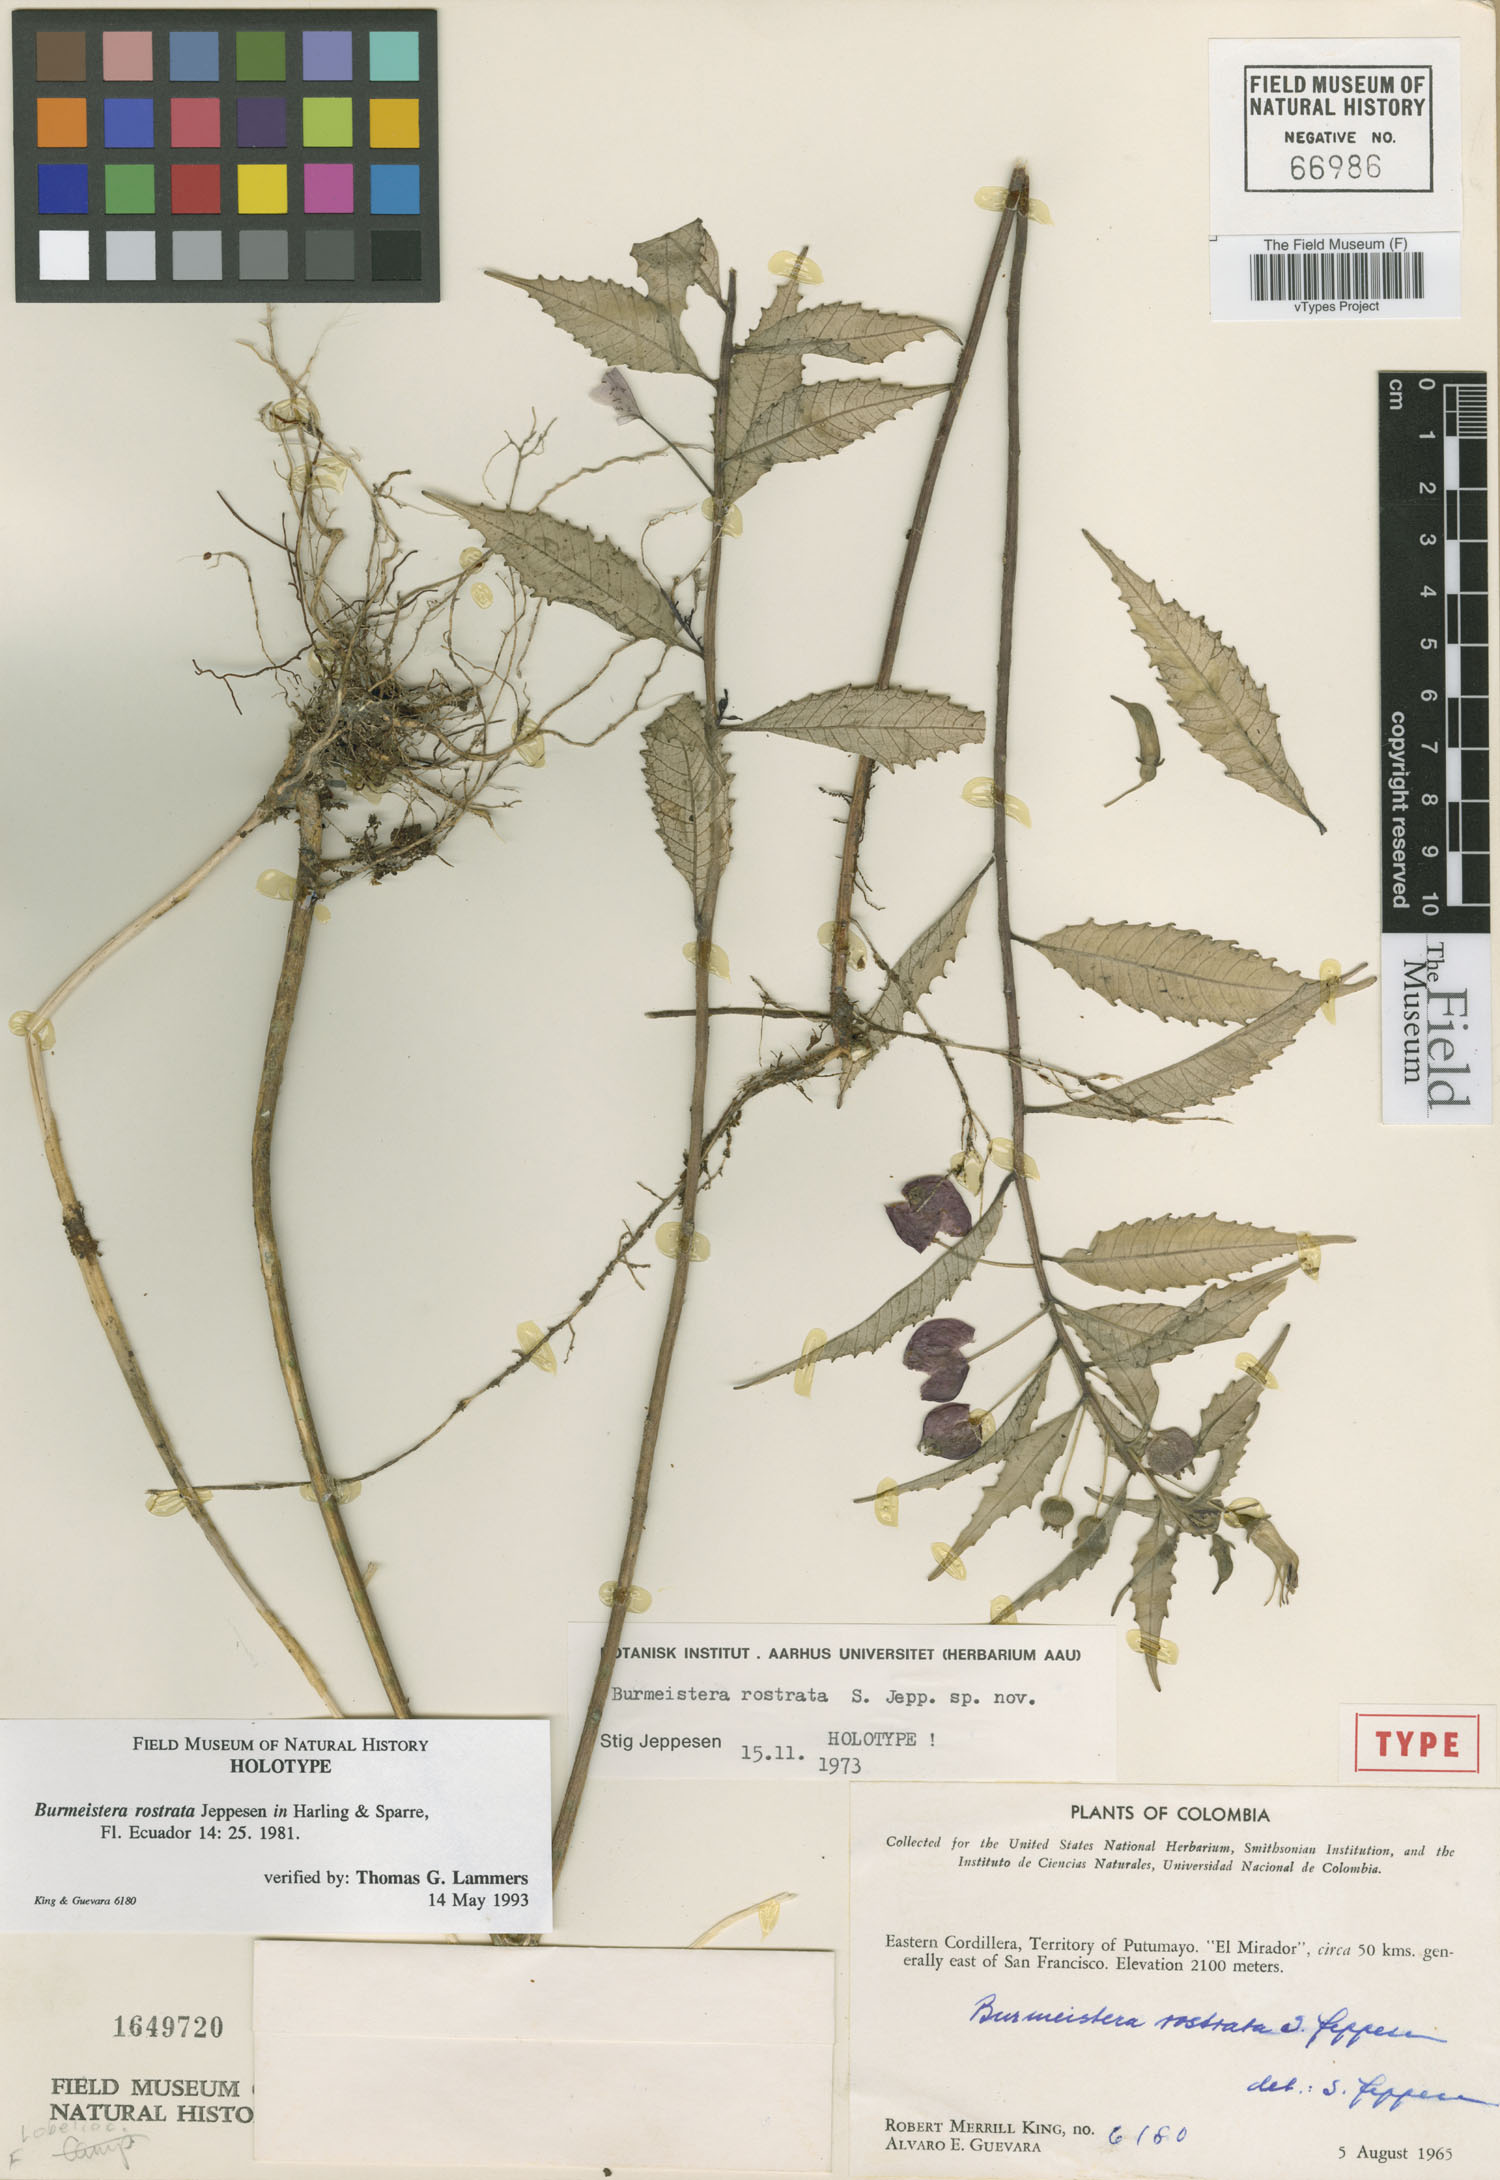 Burmeistera rostrata image